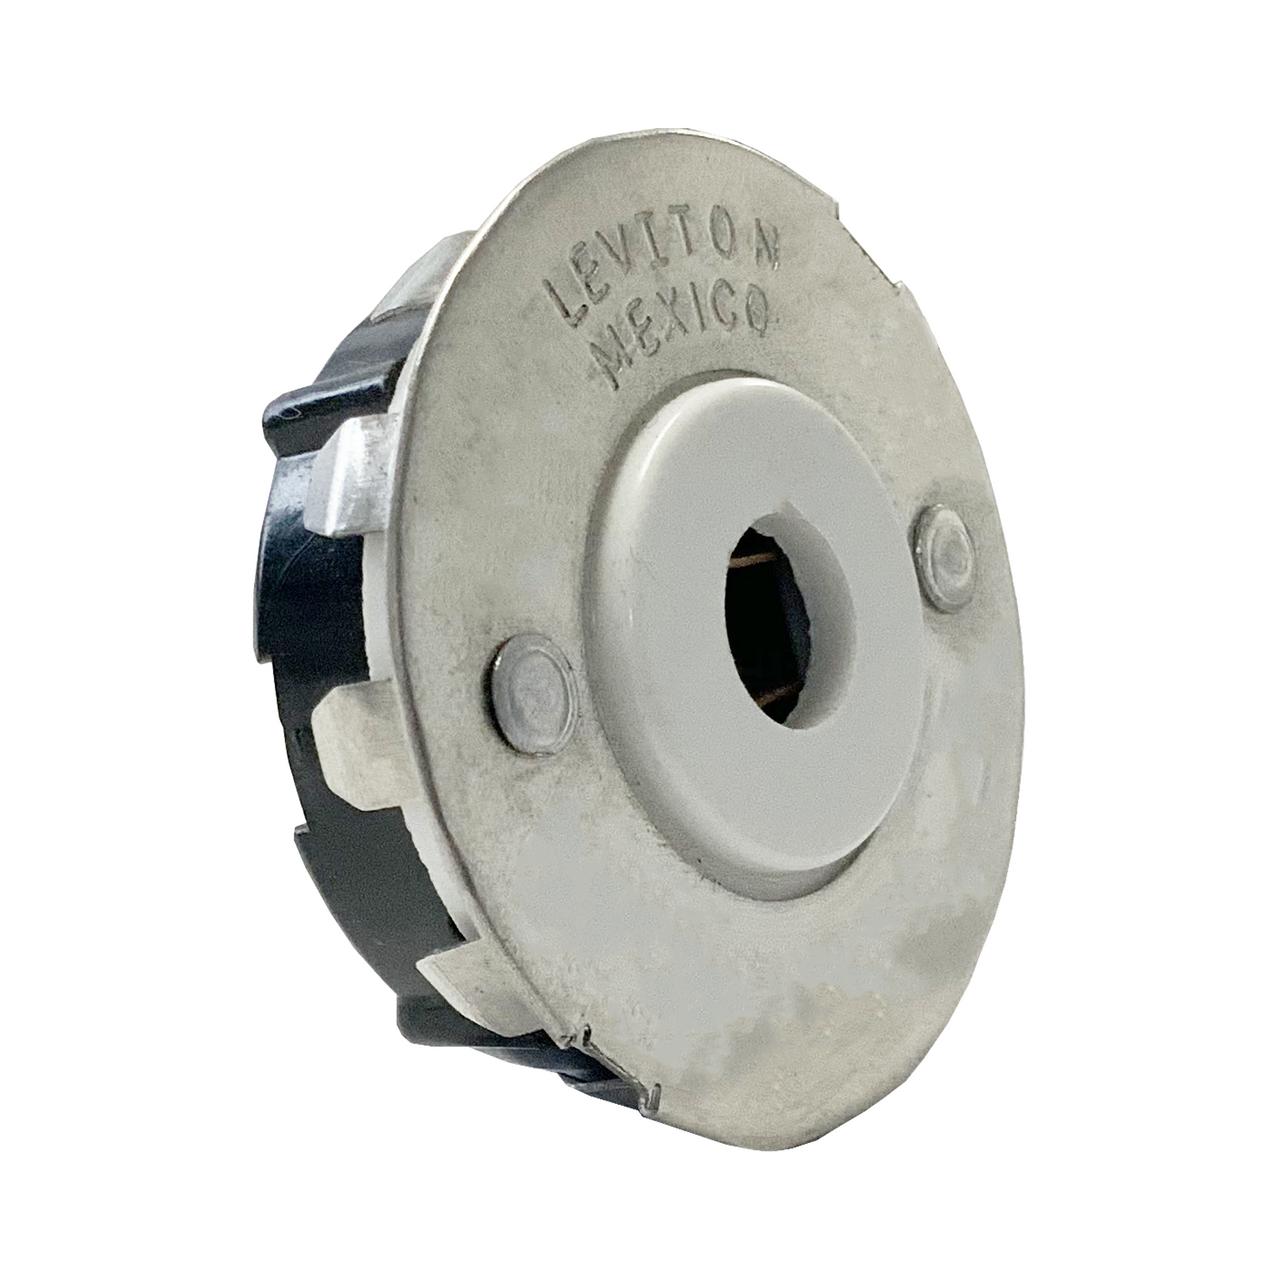 Leviton 517 T8 Or T12 Slimline Single Pin Socket Citylightsusa Com